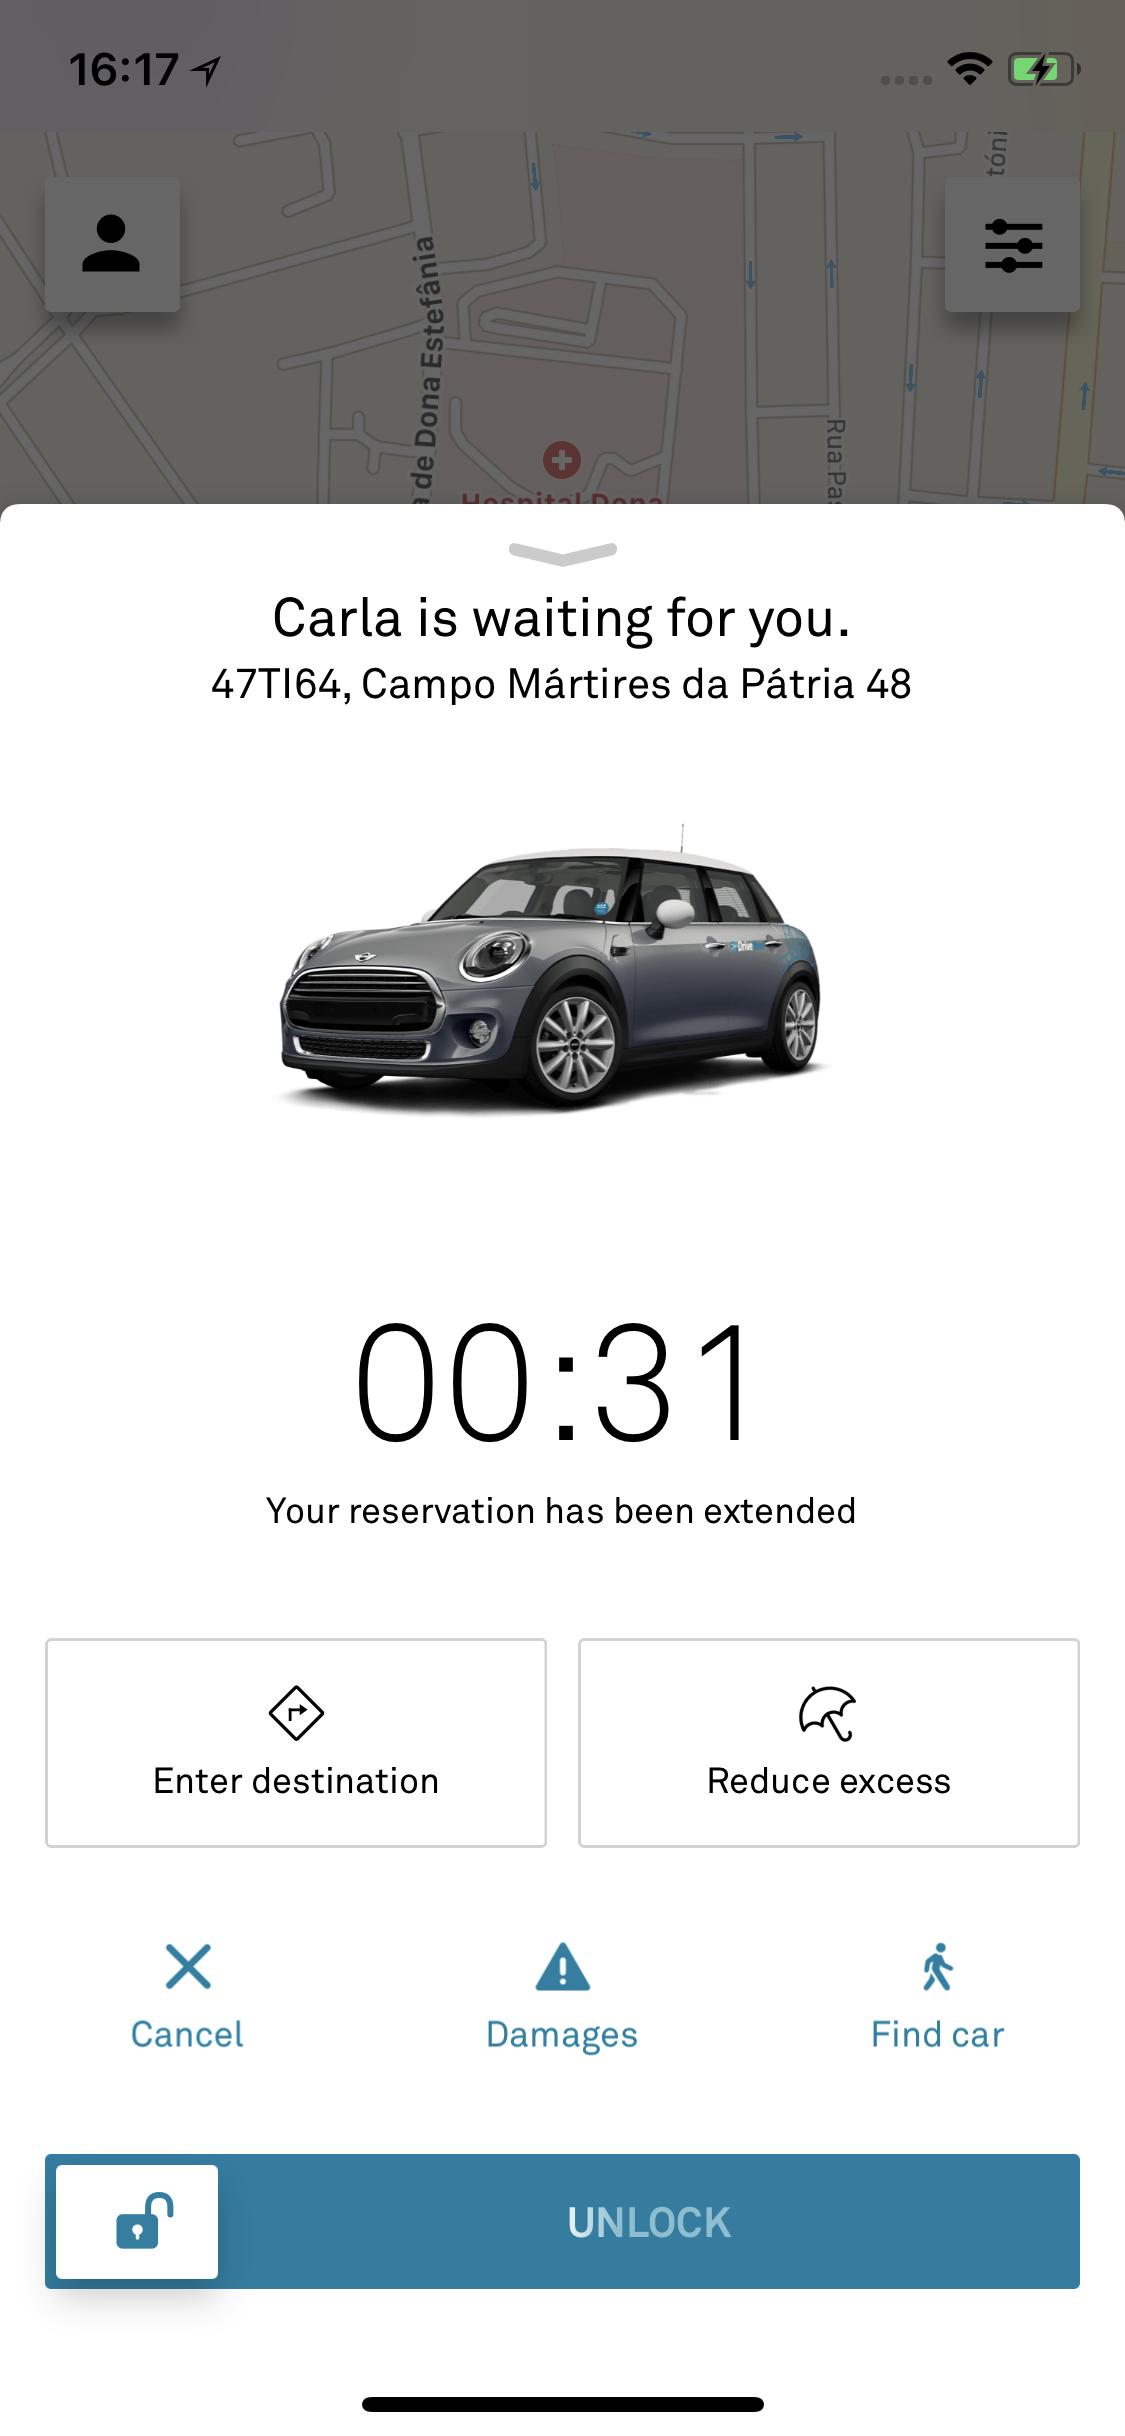 PT_carsharing_tips-tricks_extend-reservation